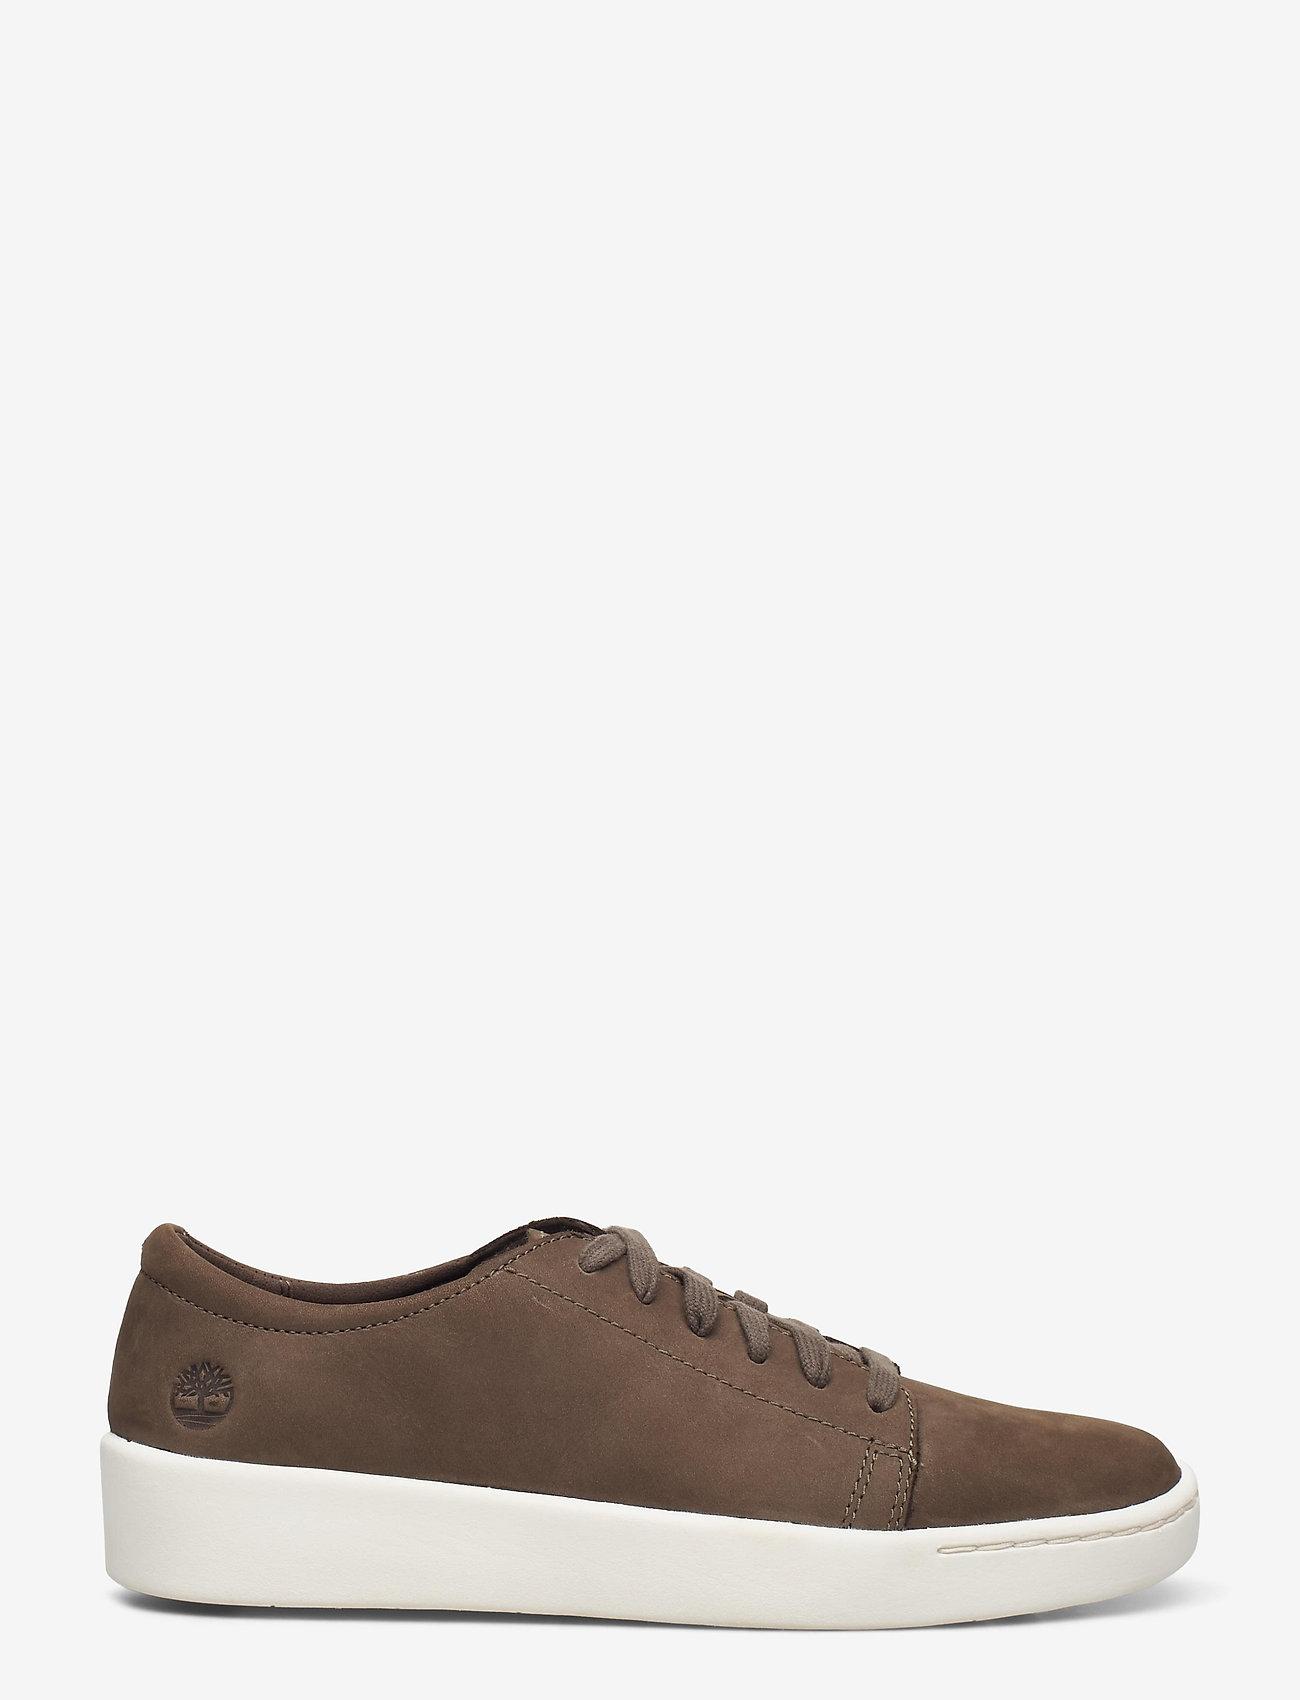 Timberland - TEYA OX OLV - lage sneakers - canteen - 1